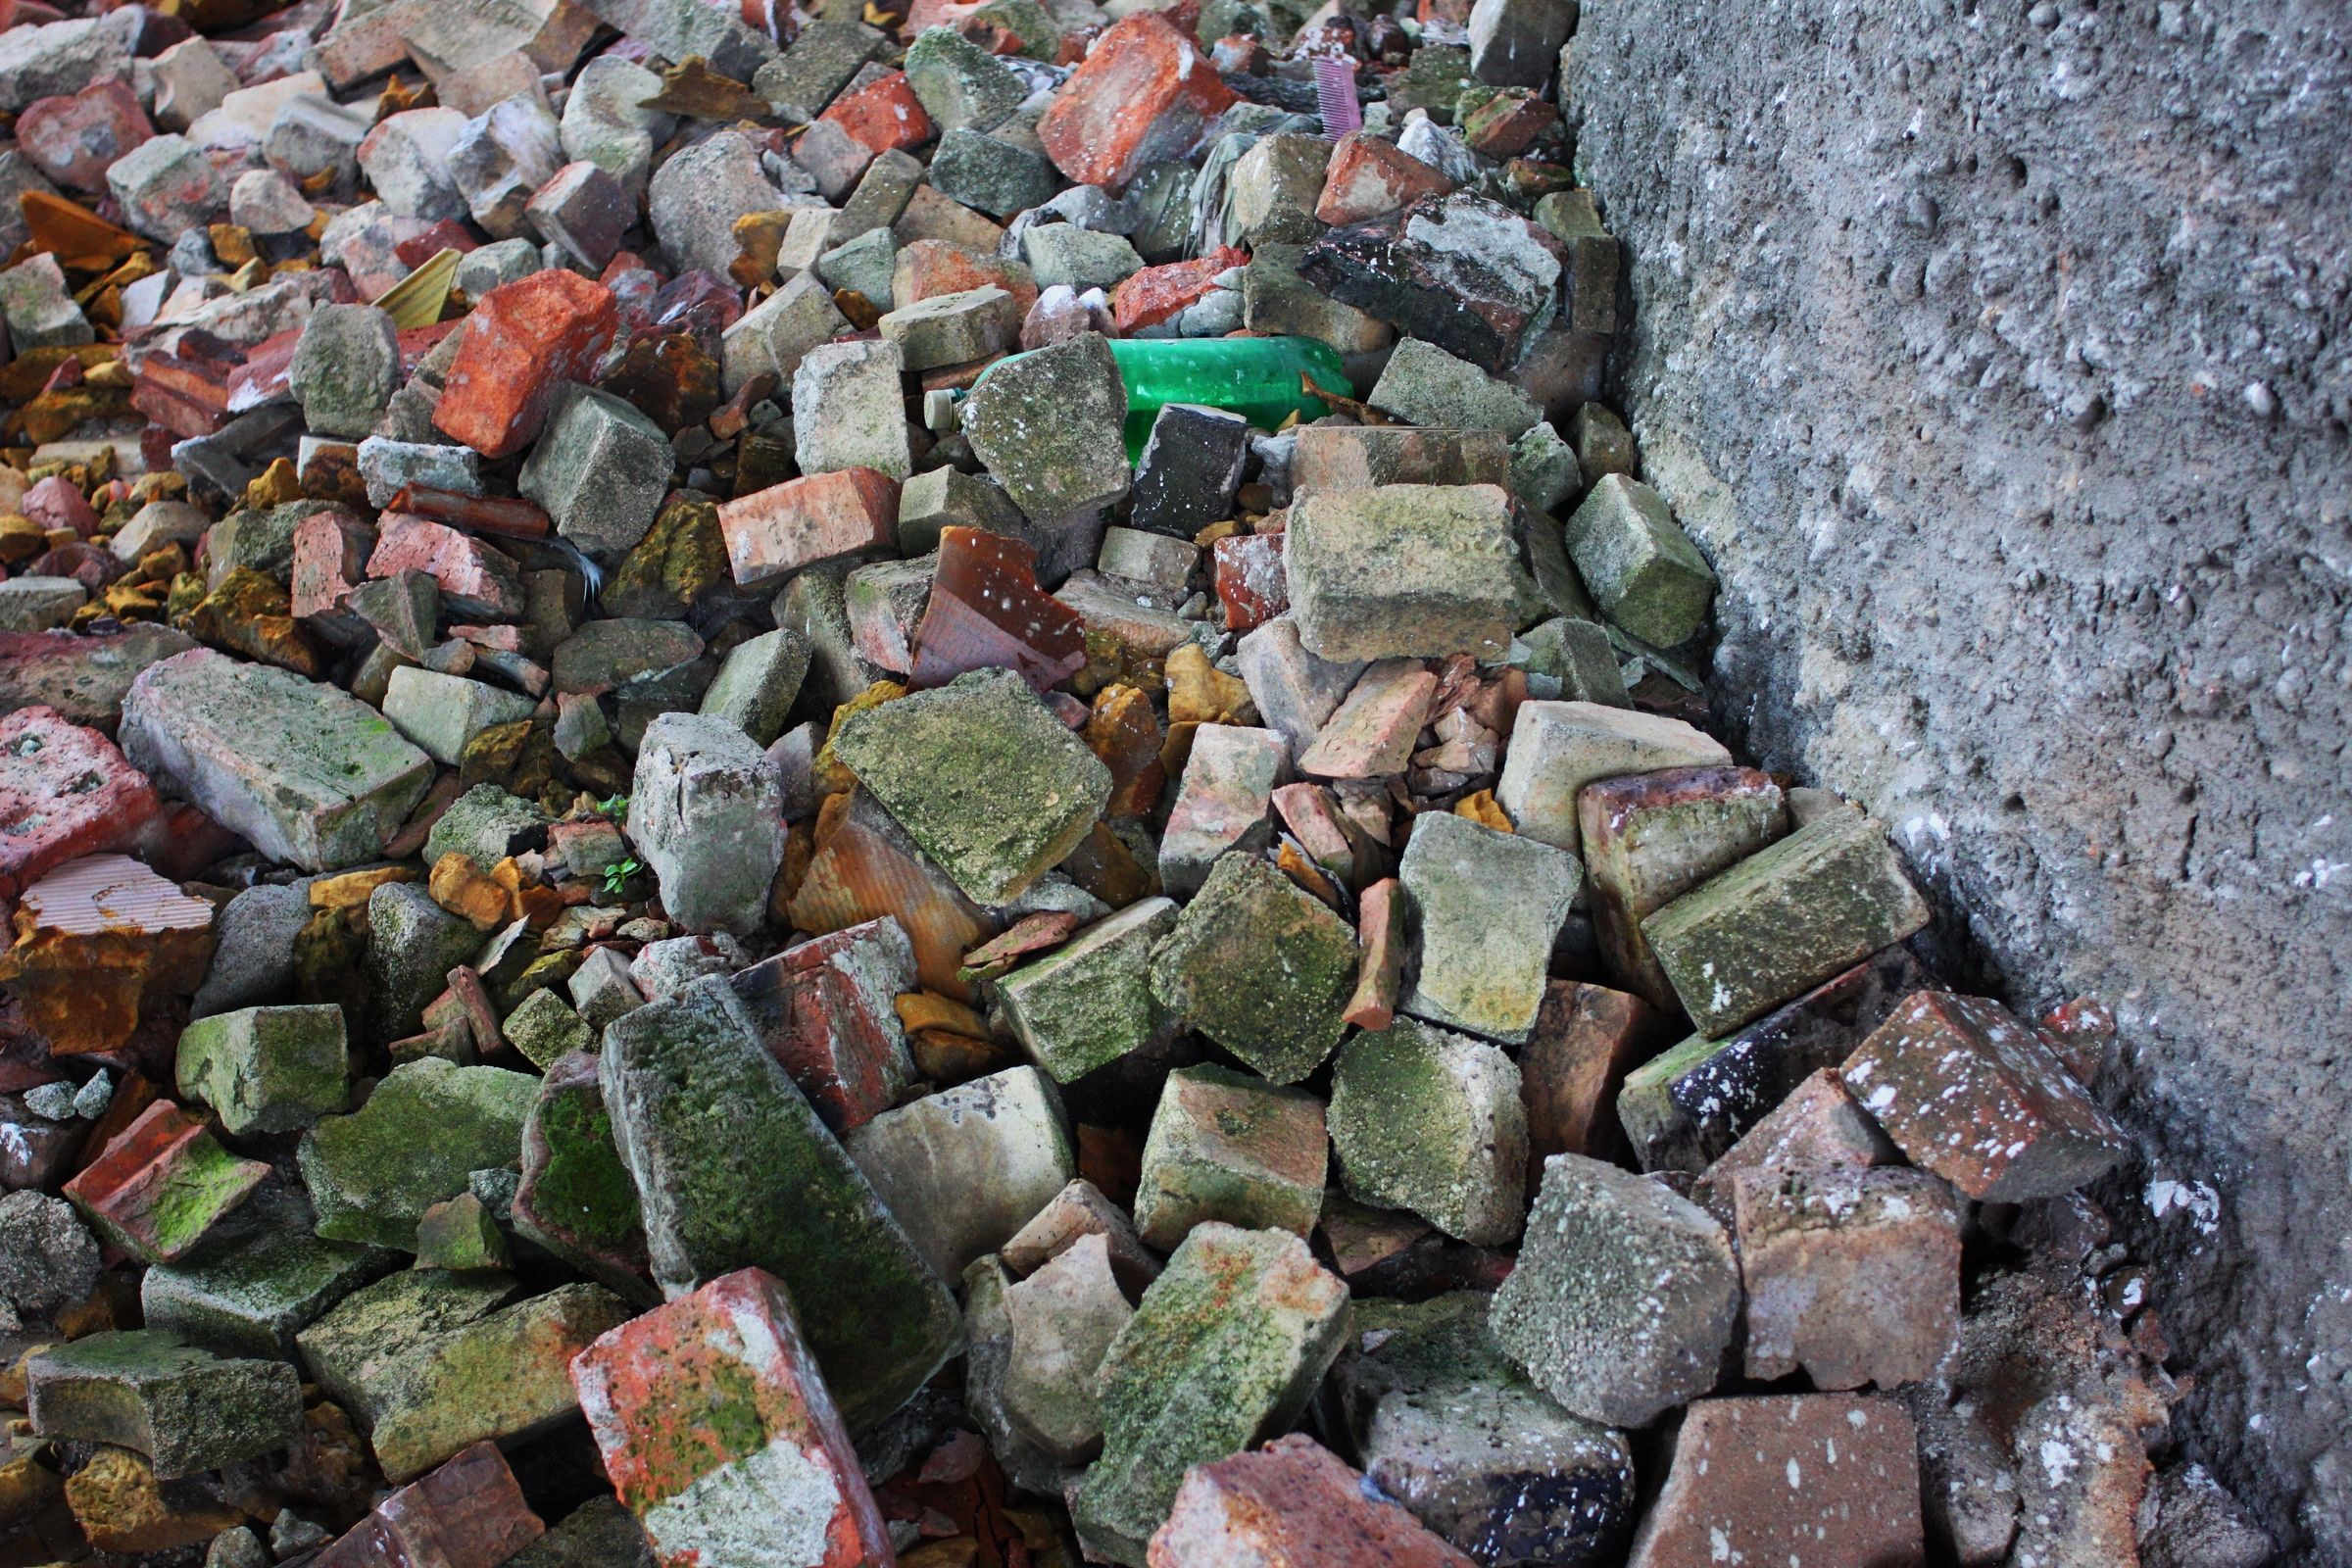 coloured stones (Photo by Péter Dóka)